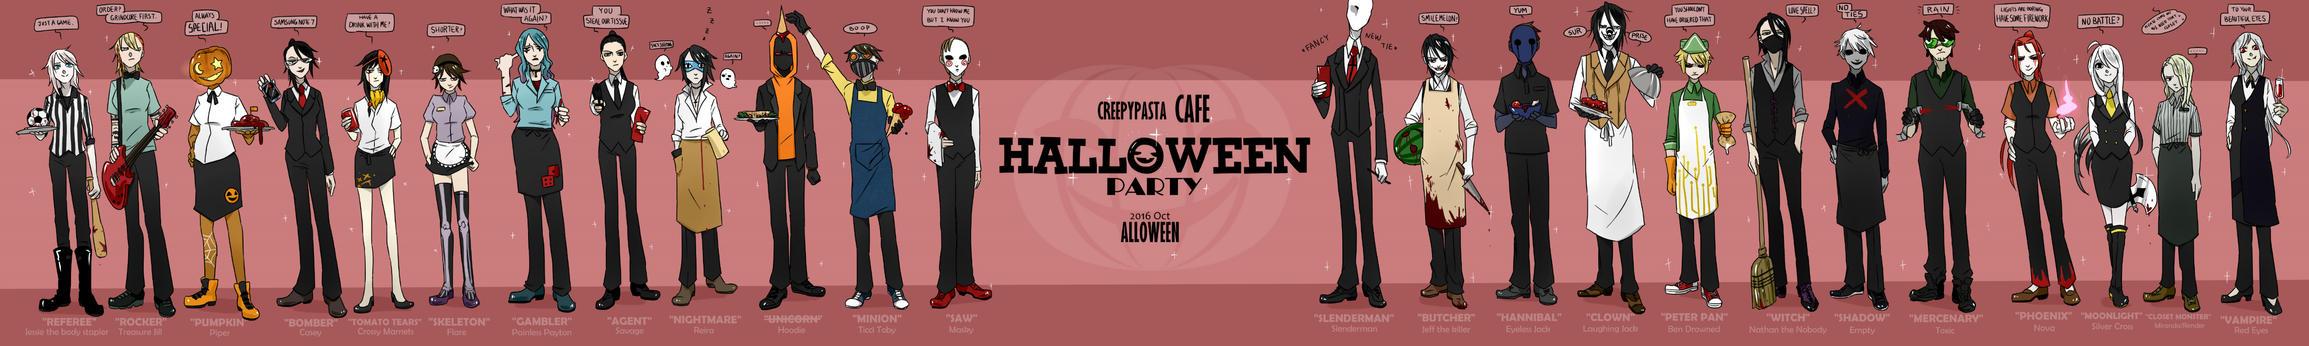 Creepypasta Cafe : Halloween Party #1 by Alloween